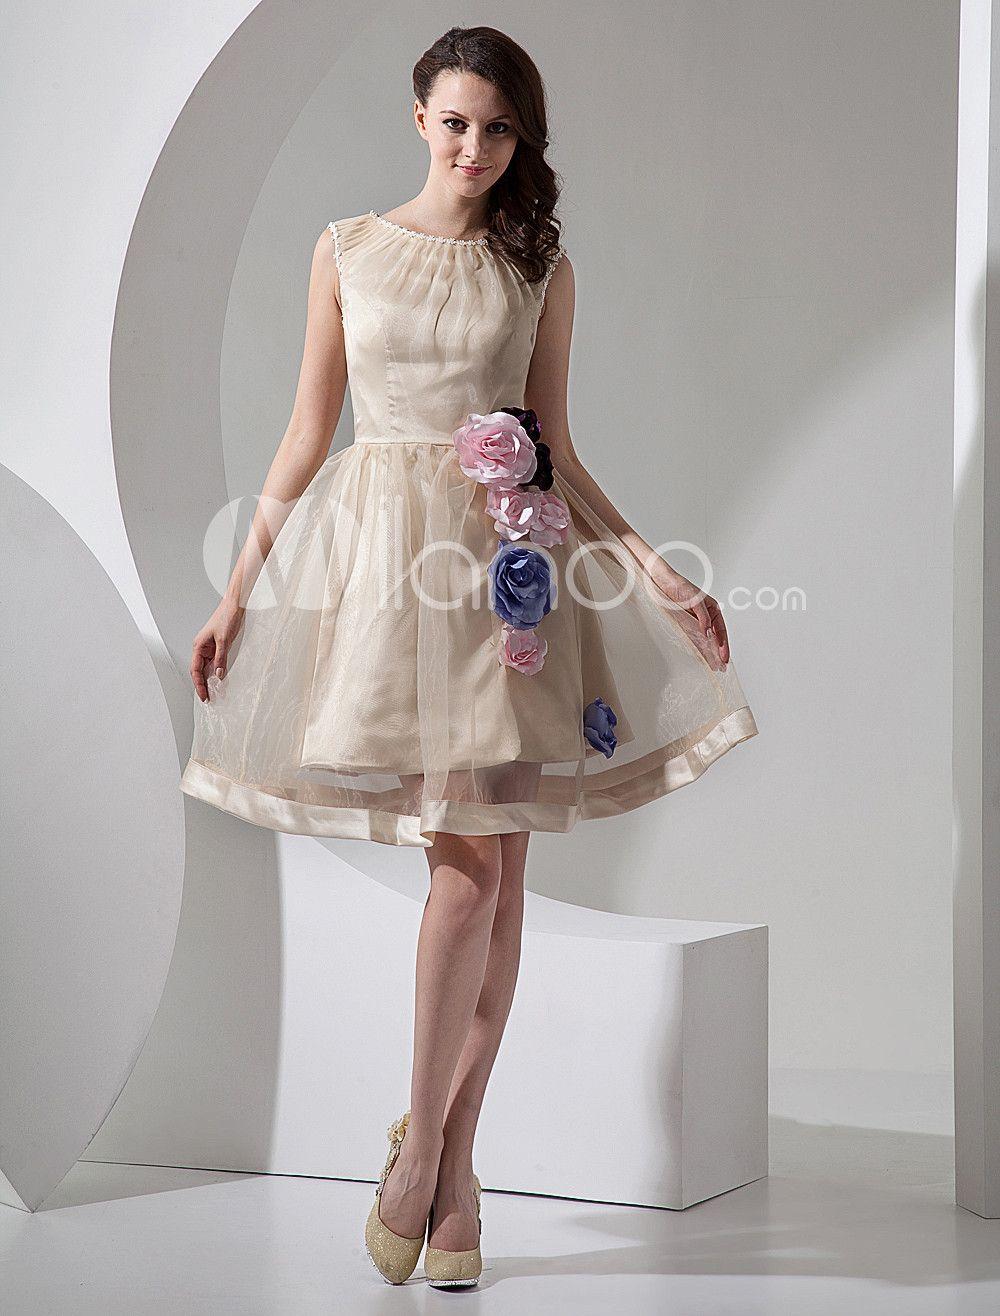 Mini wedding dresses  Champagne Aline Short Organza Mini Wedding Dress  Mini wedding